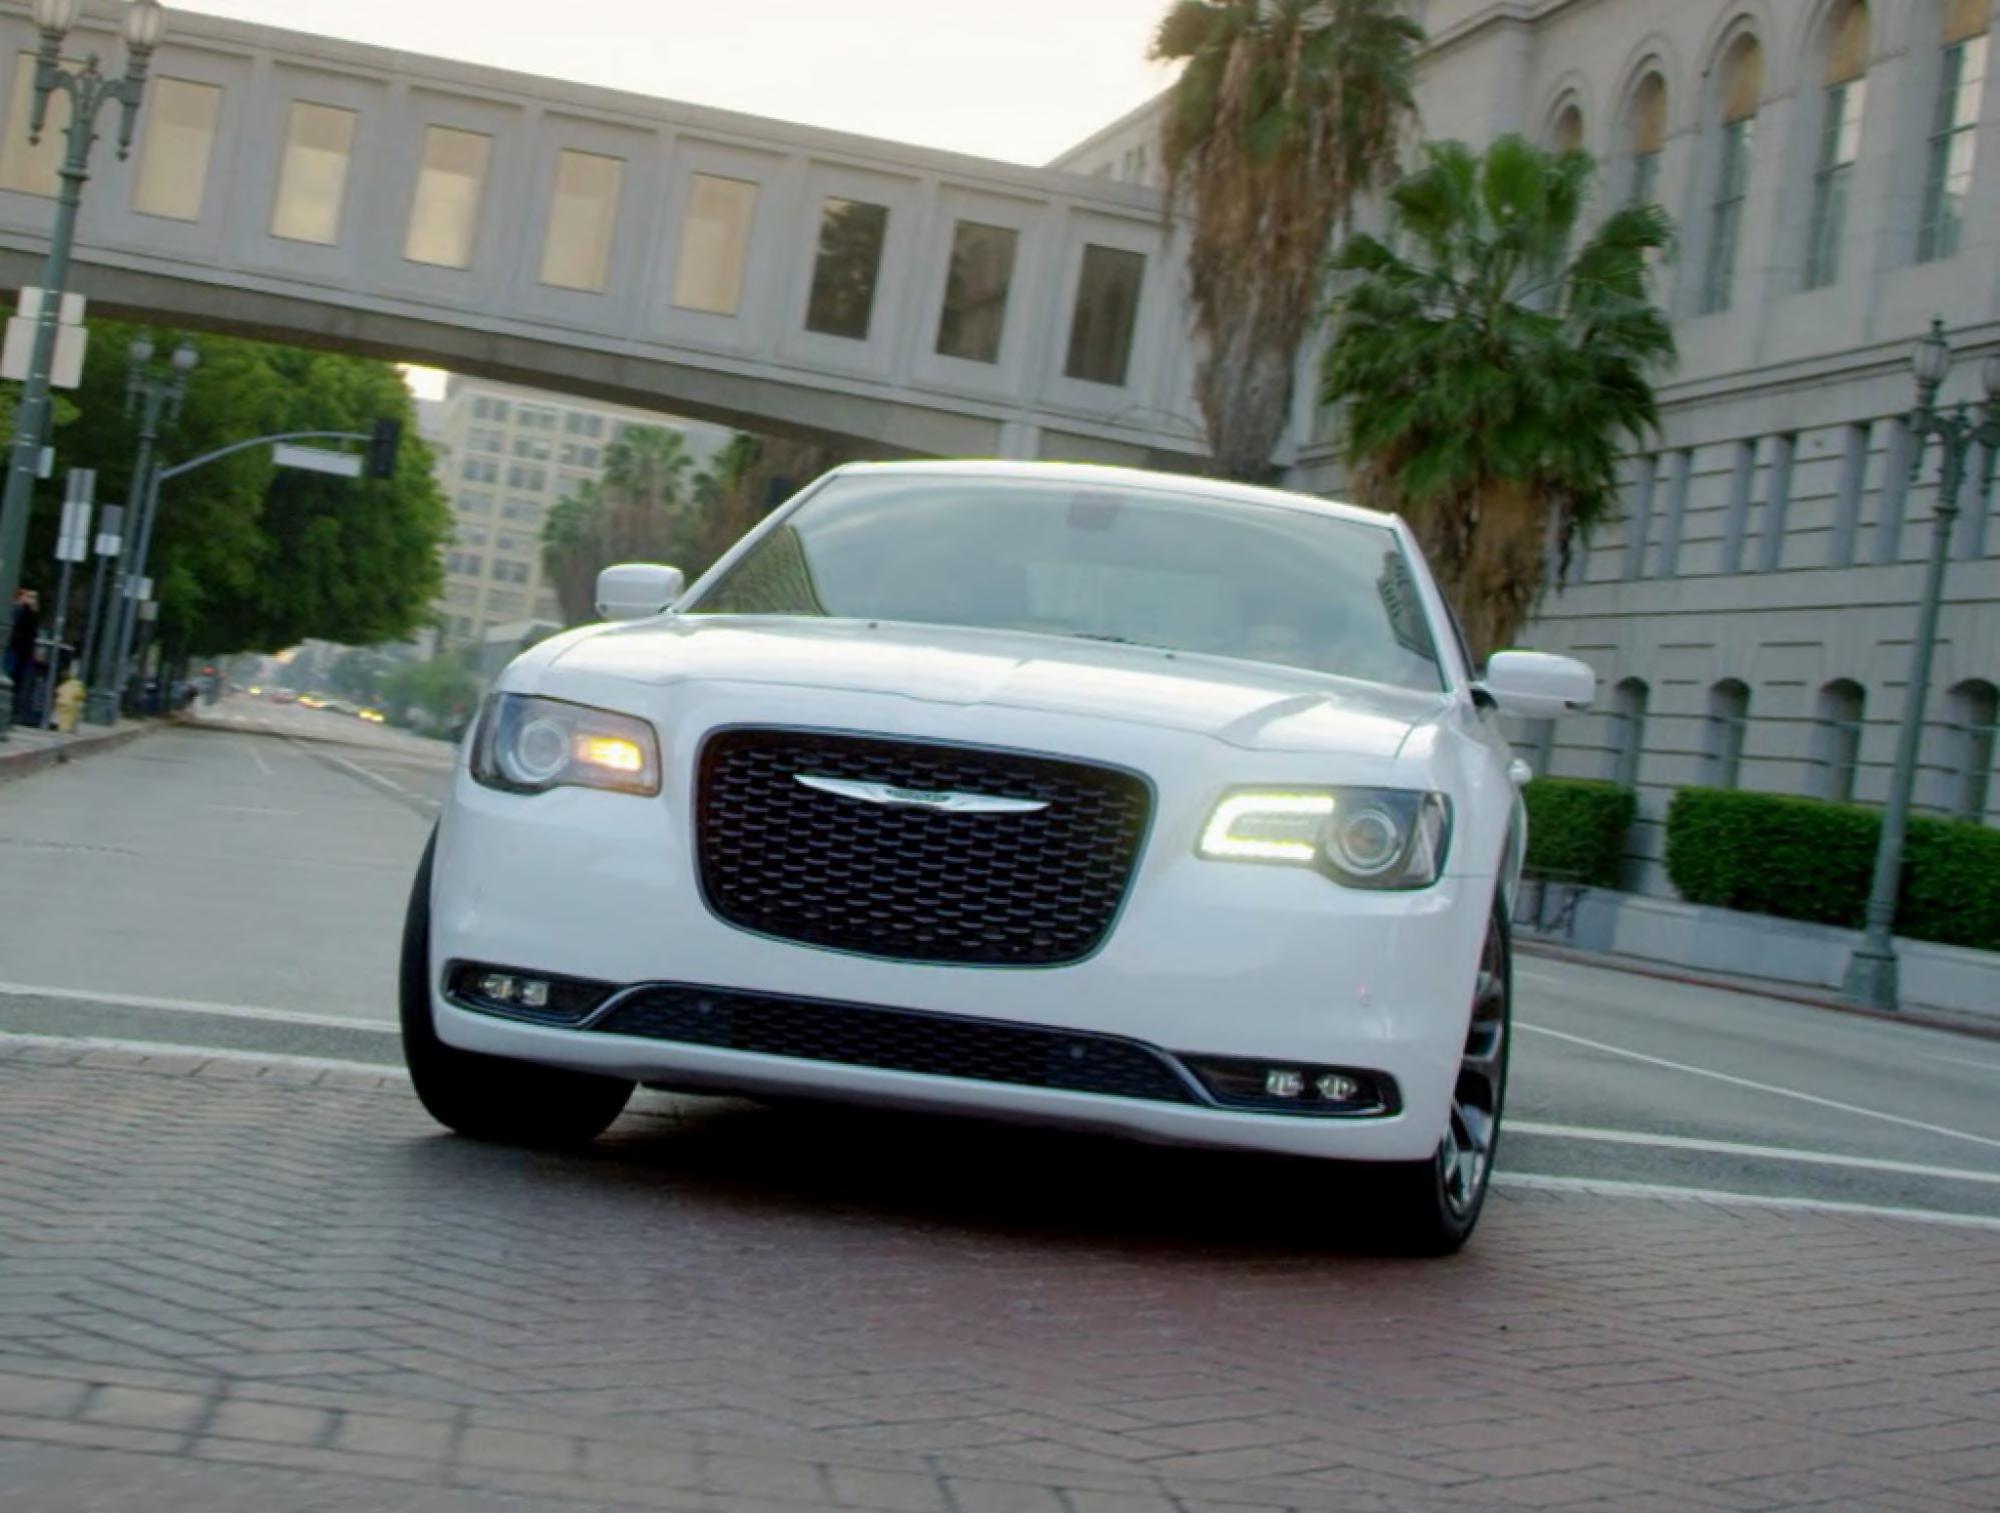 2019 Chrysler 300 - Performance